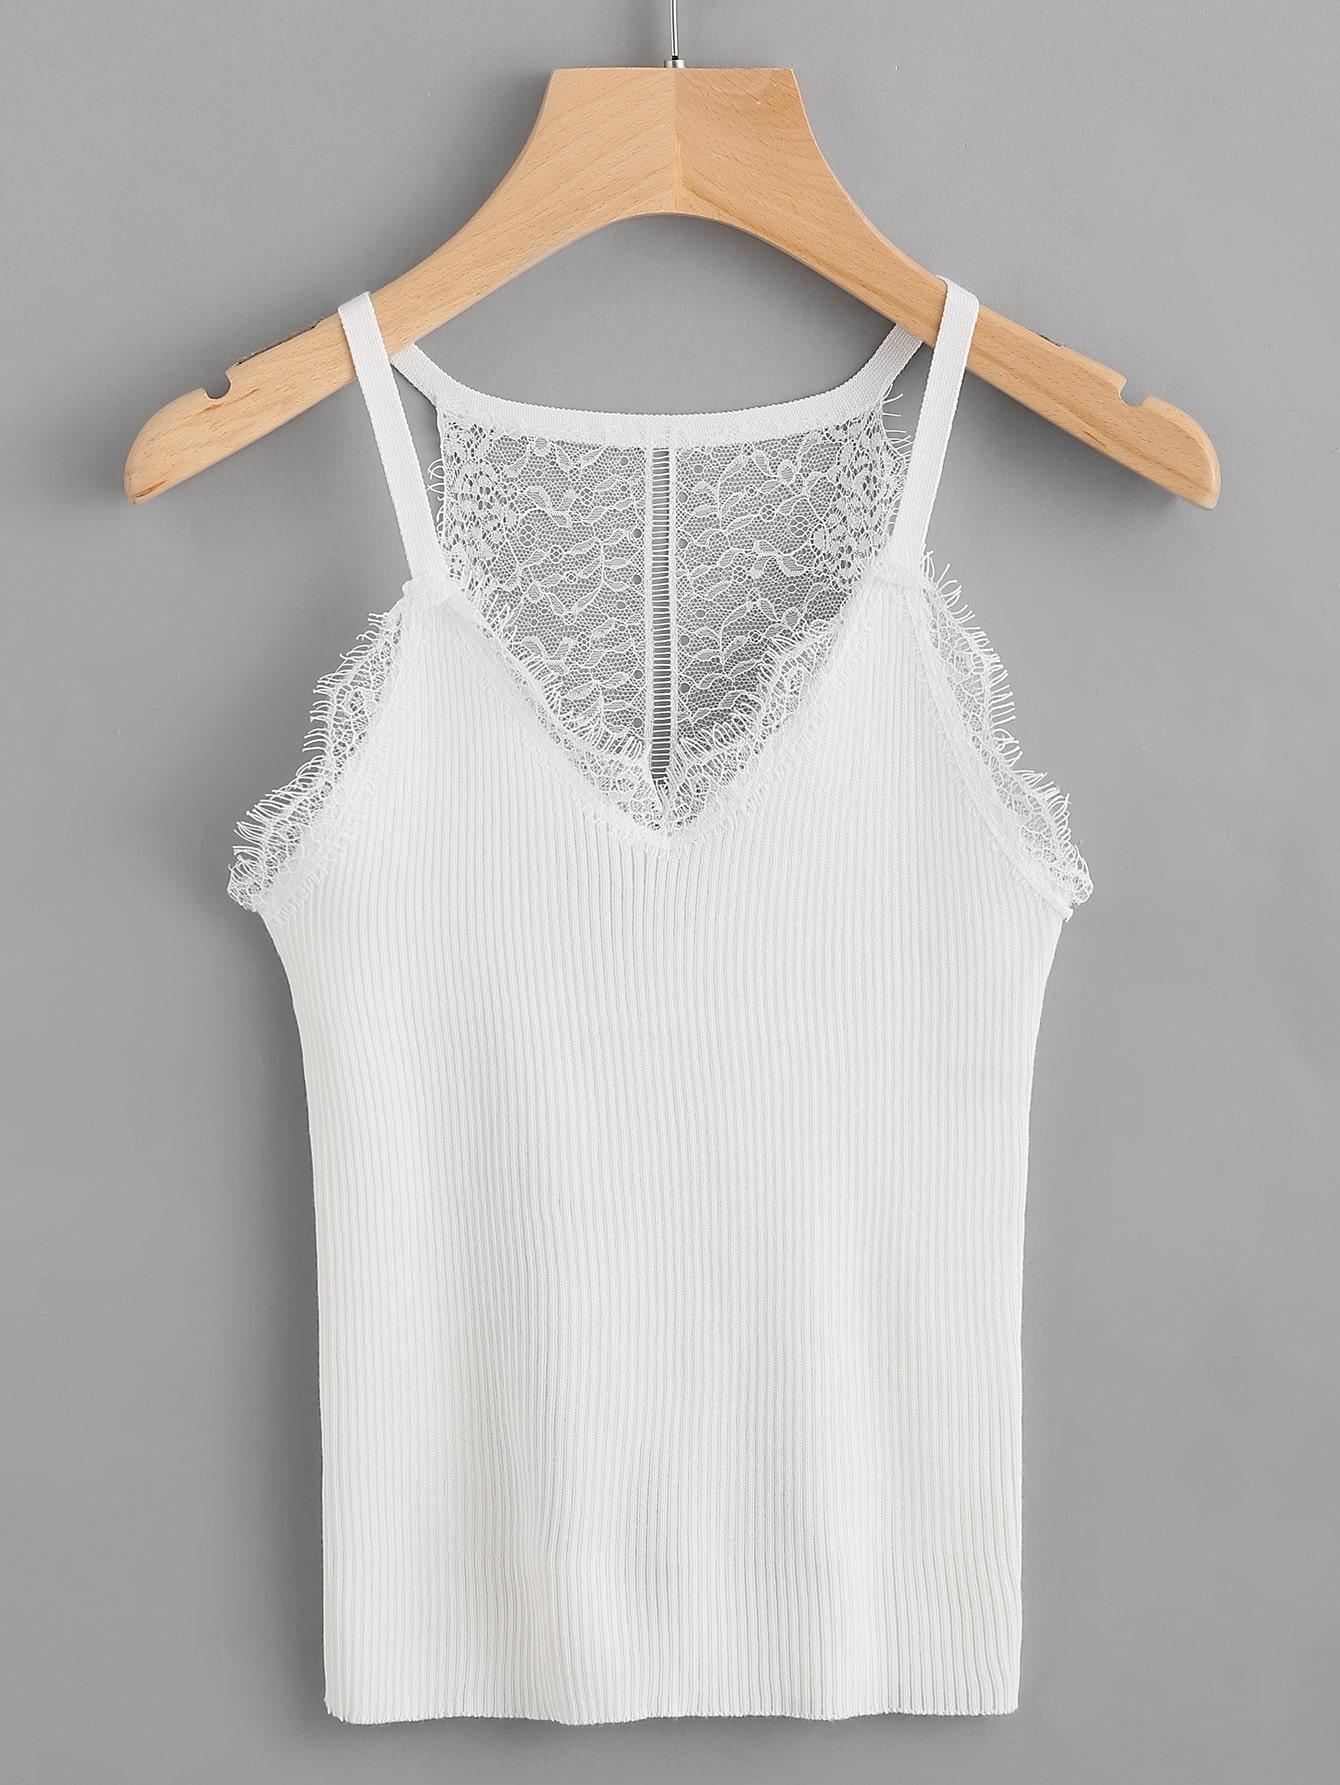 Contrast Eyelash Lace Trim Ribbed Hollow Out Top vest170503104